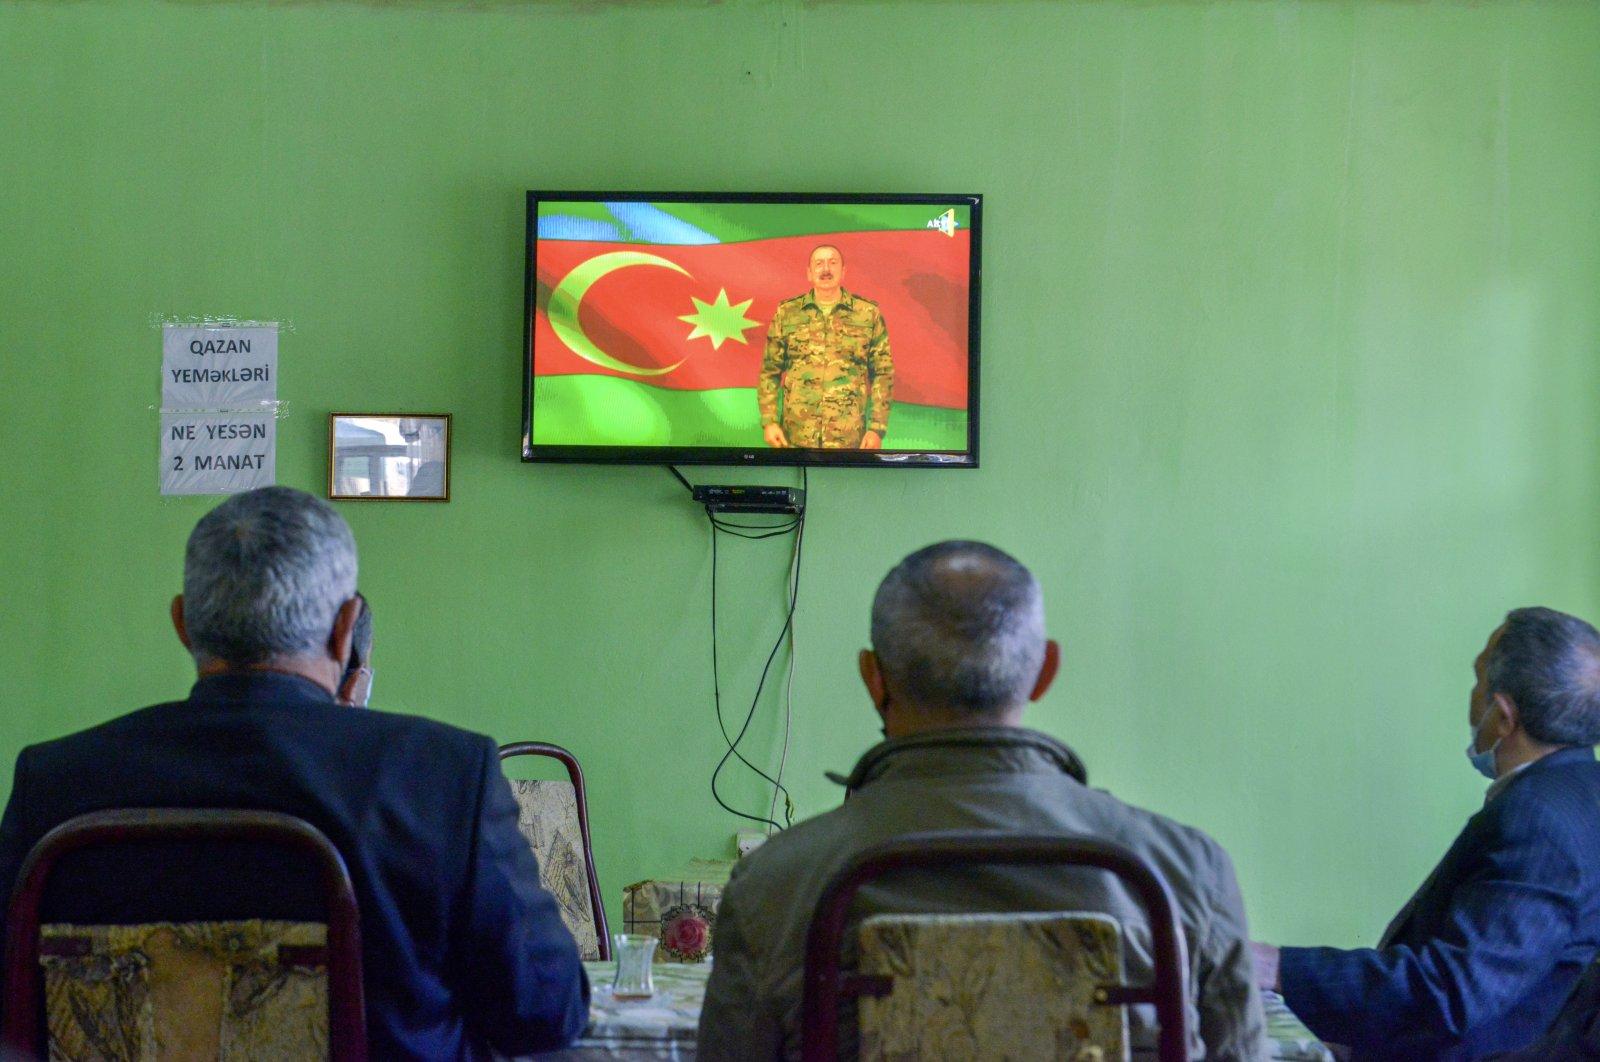 People listen to Azerbaijan's President Ilham Aliyev speaking on a television at a teahouse in Barda, Azerbaijan, Nov. 8, 2020. (AP Photo)